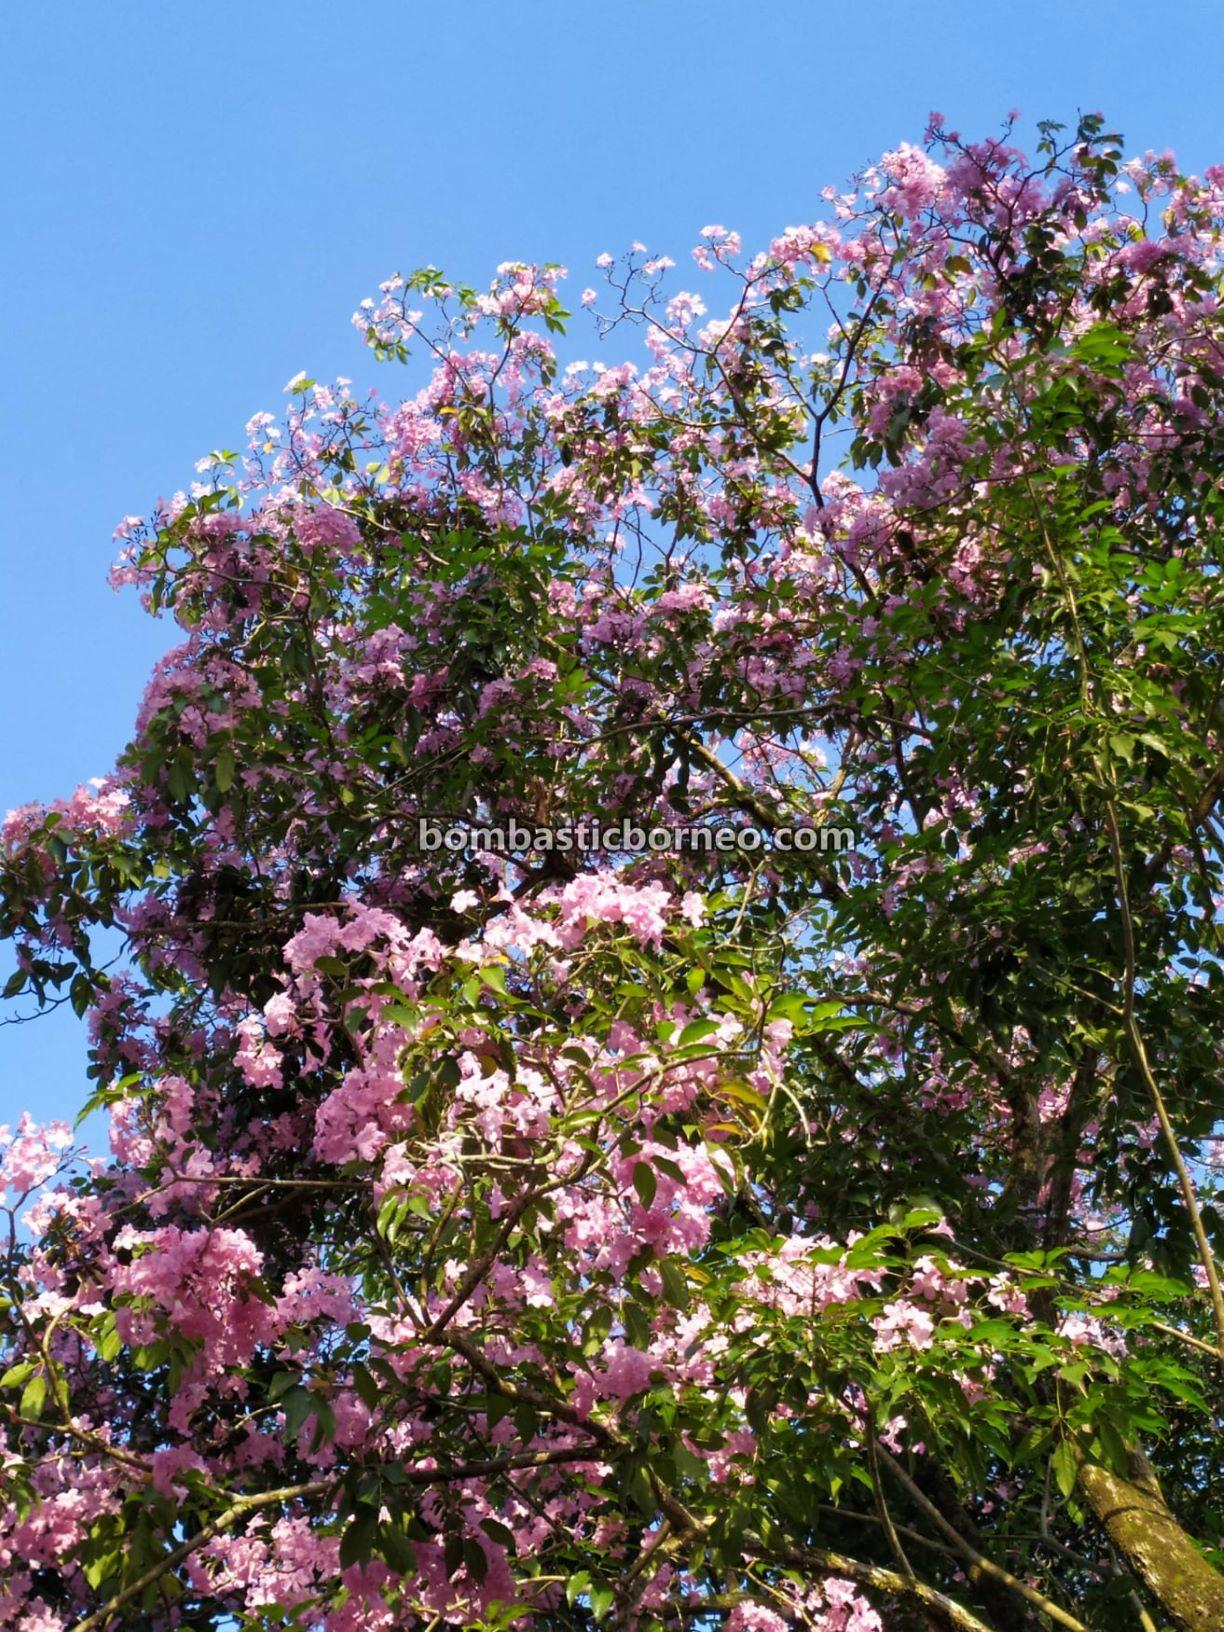 Tabebuia pallida, Tabebuia pentaphylla, Tabebuia rosea, Tecoma, Sakura flowers, Cherry Blossoms, Trumpet tree, blooming, flora, flowers, spring, Kuching South City Council, nature, Sarawak, Malaysia,